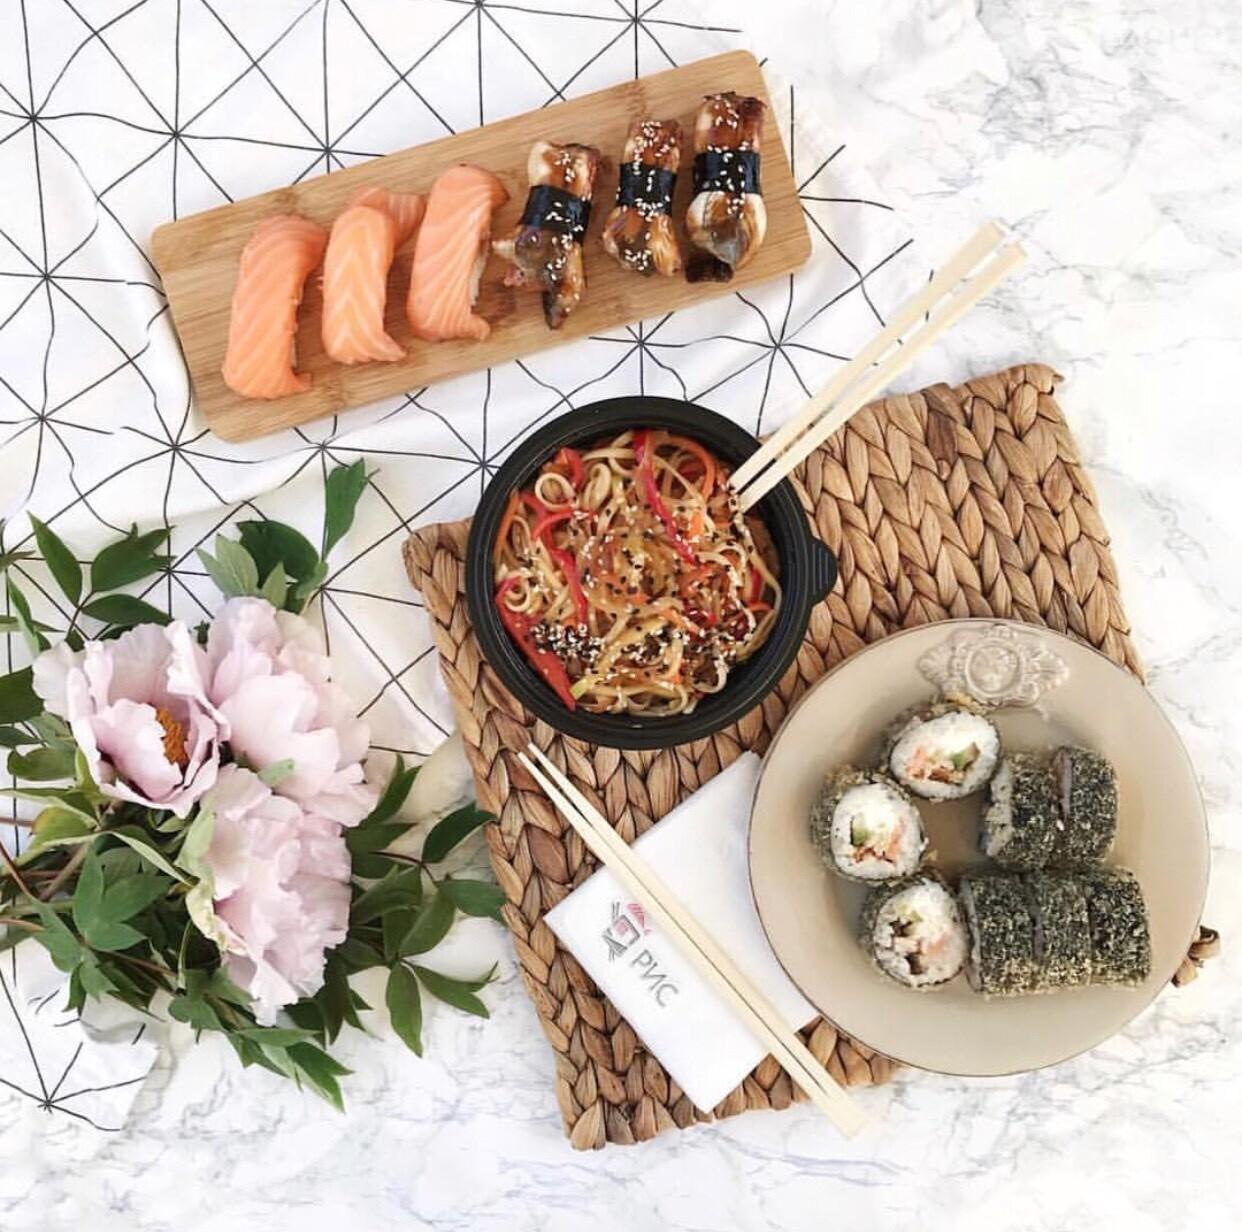 ris.od.ua - японская кухня у вас дома!, фото-2